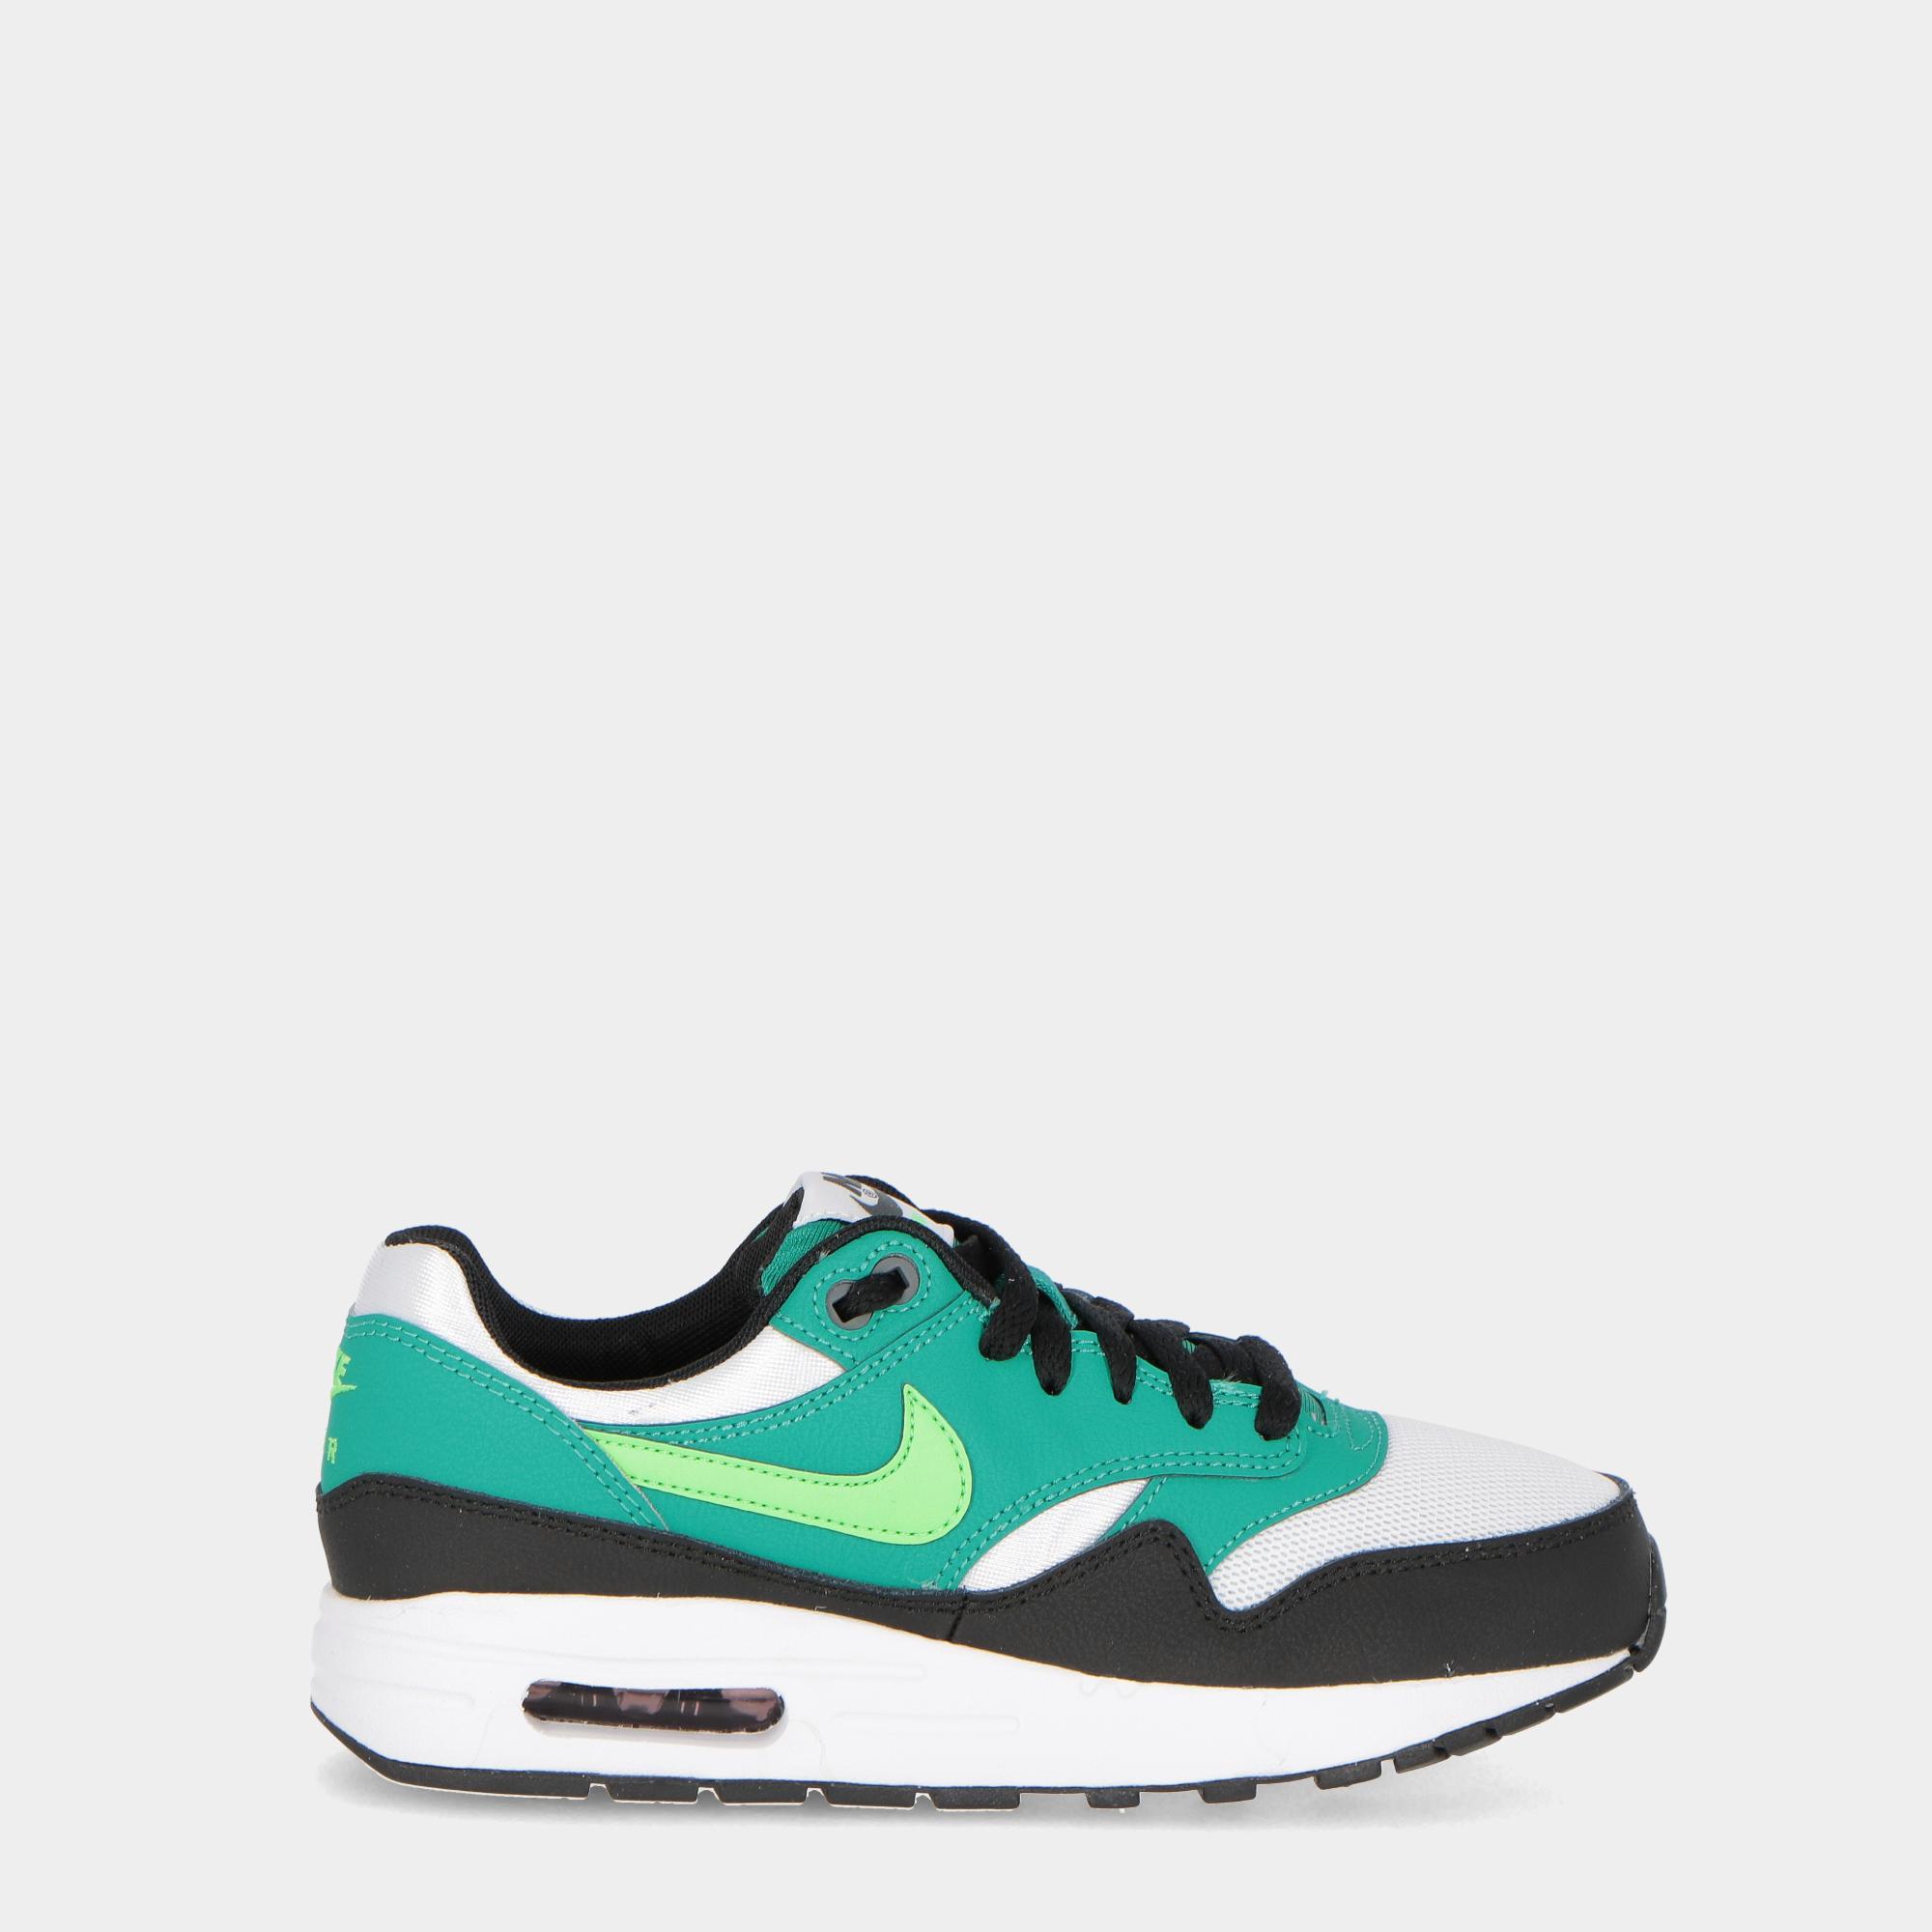 buy popular 490c1 e1b69 Nike Air Max 1 (gs) - Kids Green white